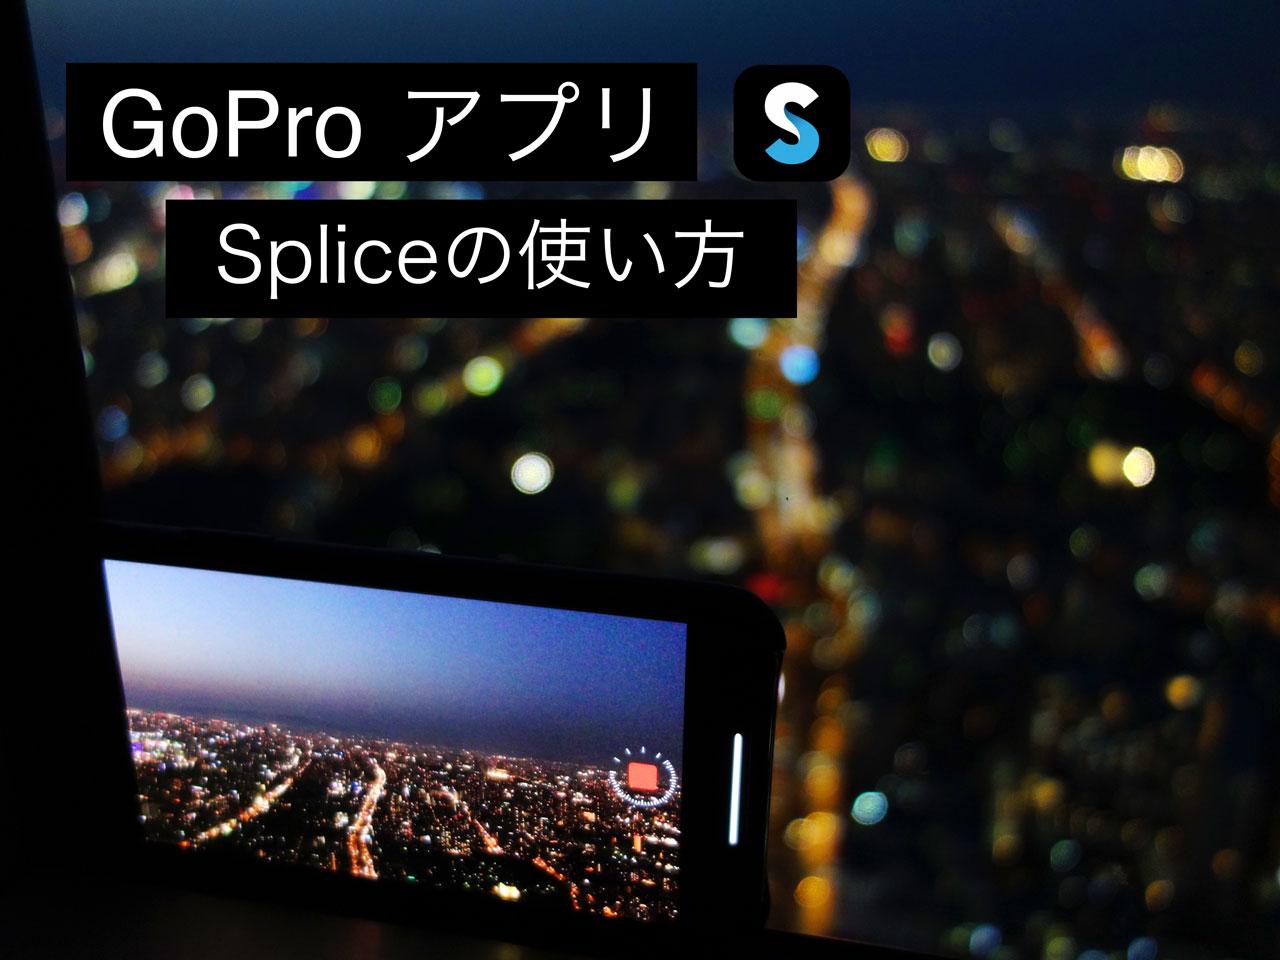 GoProアプリSpliceの使い方 – スマホで動画編集